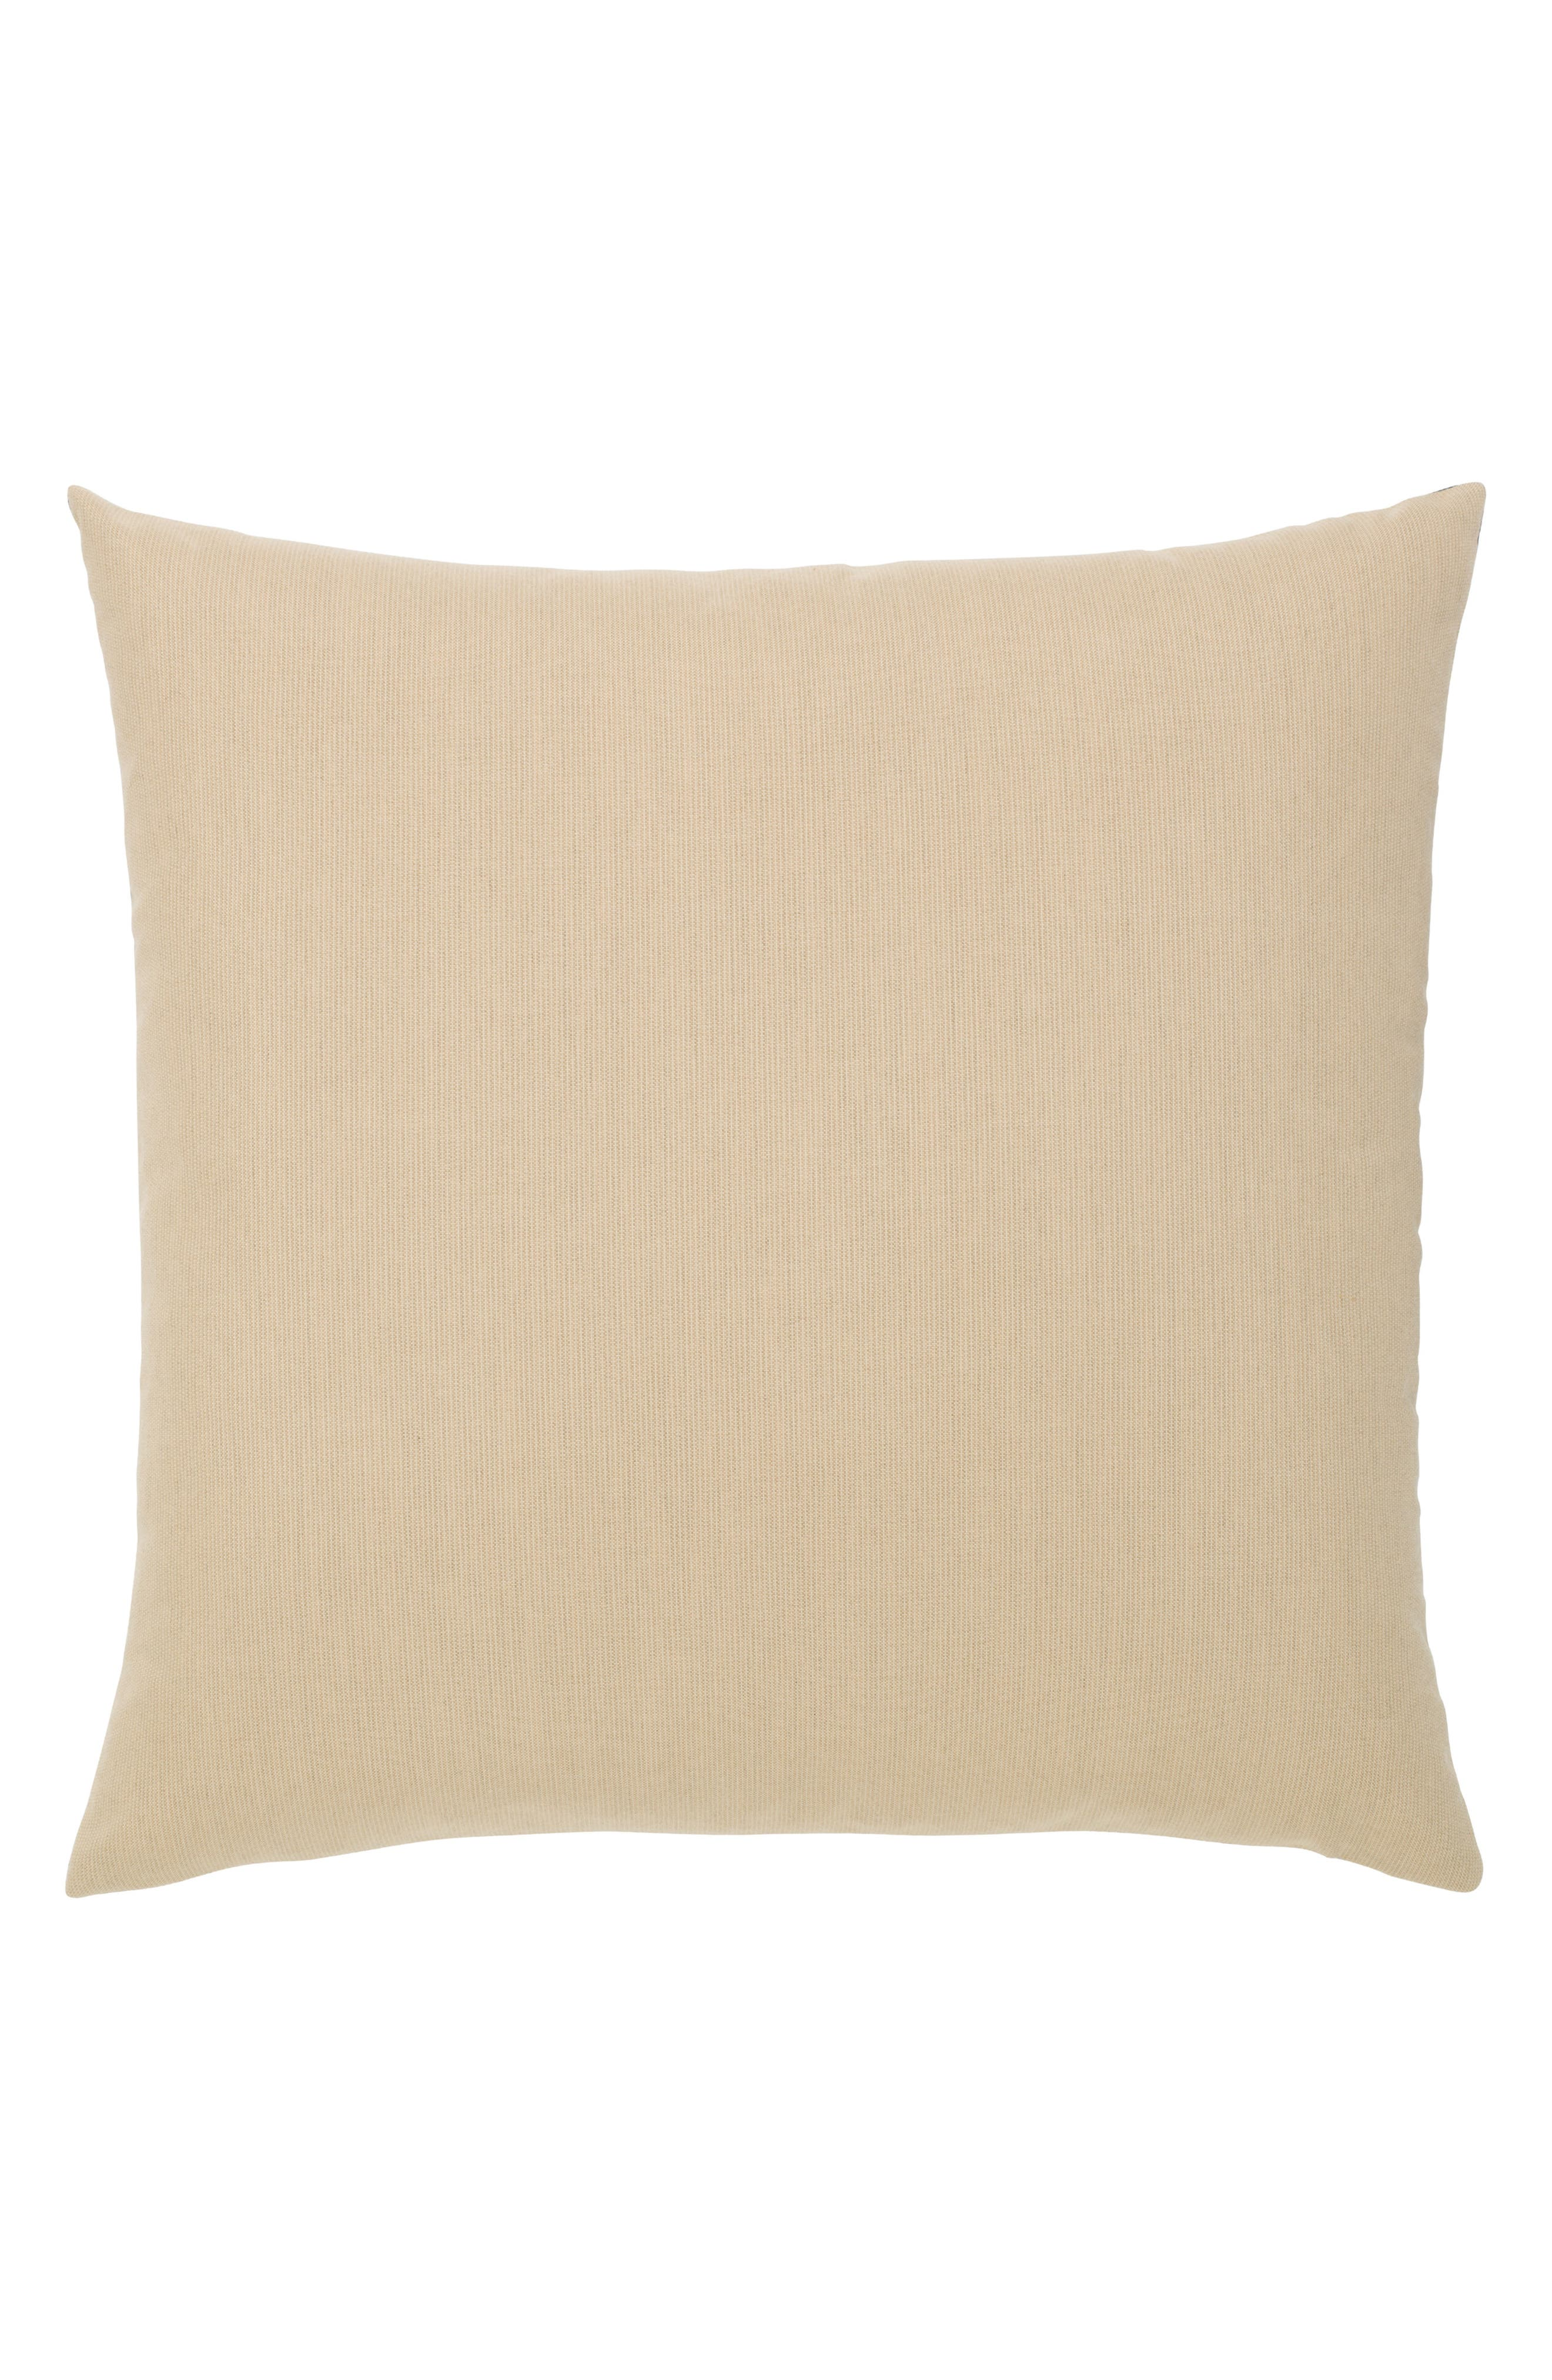 Progression Accent Pillow,                             Alternate thumbnail 2, color,                             BLUE/ BROWN